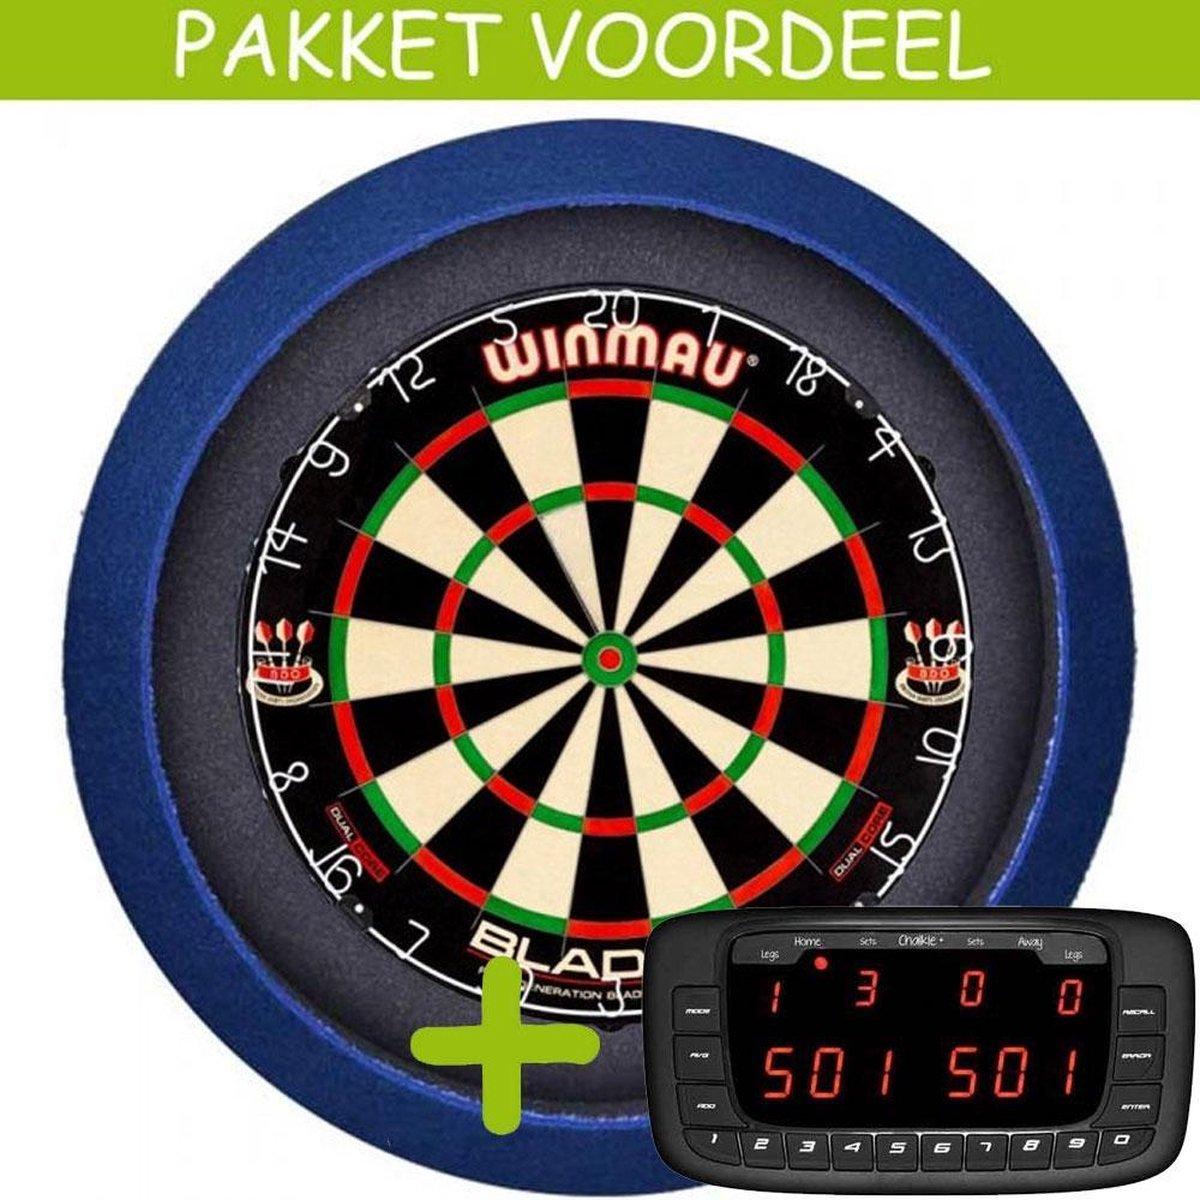 Elektronisch Dart Scorebord VoordeelPakket (Chalkie + ) - Dual Core - Dartbordverlichting Basic (Blauw)